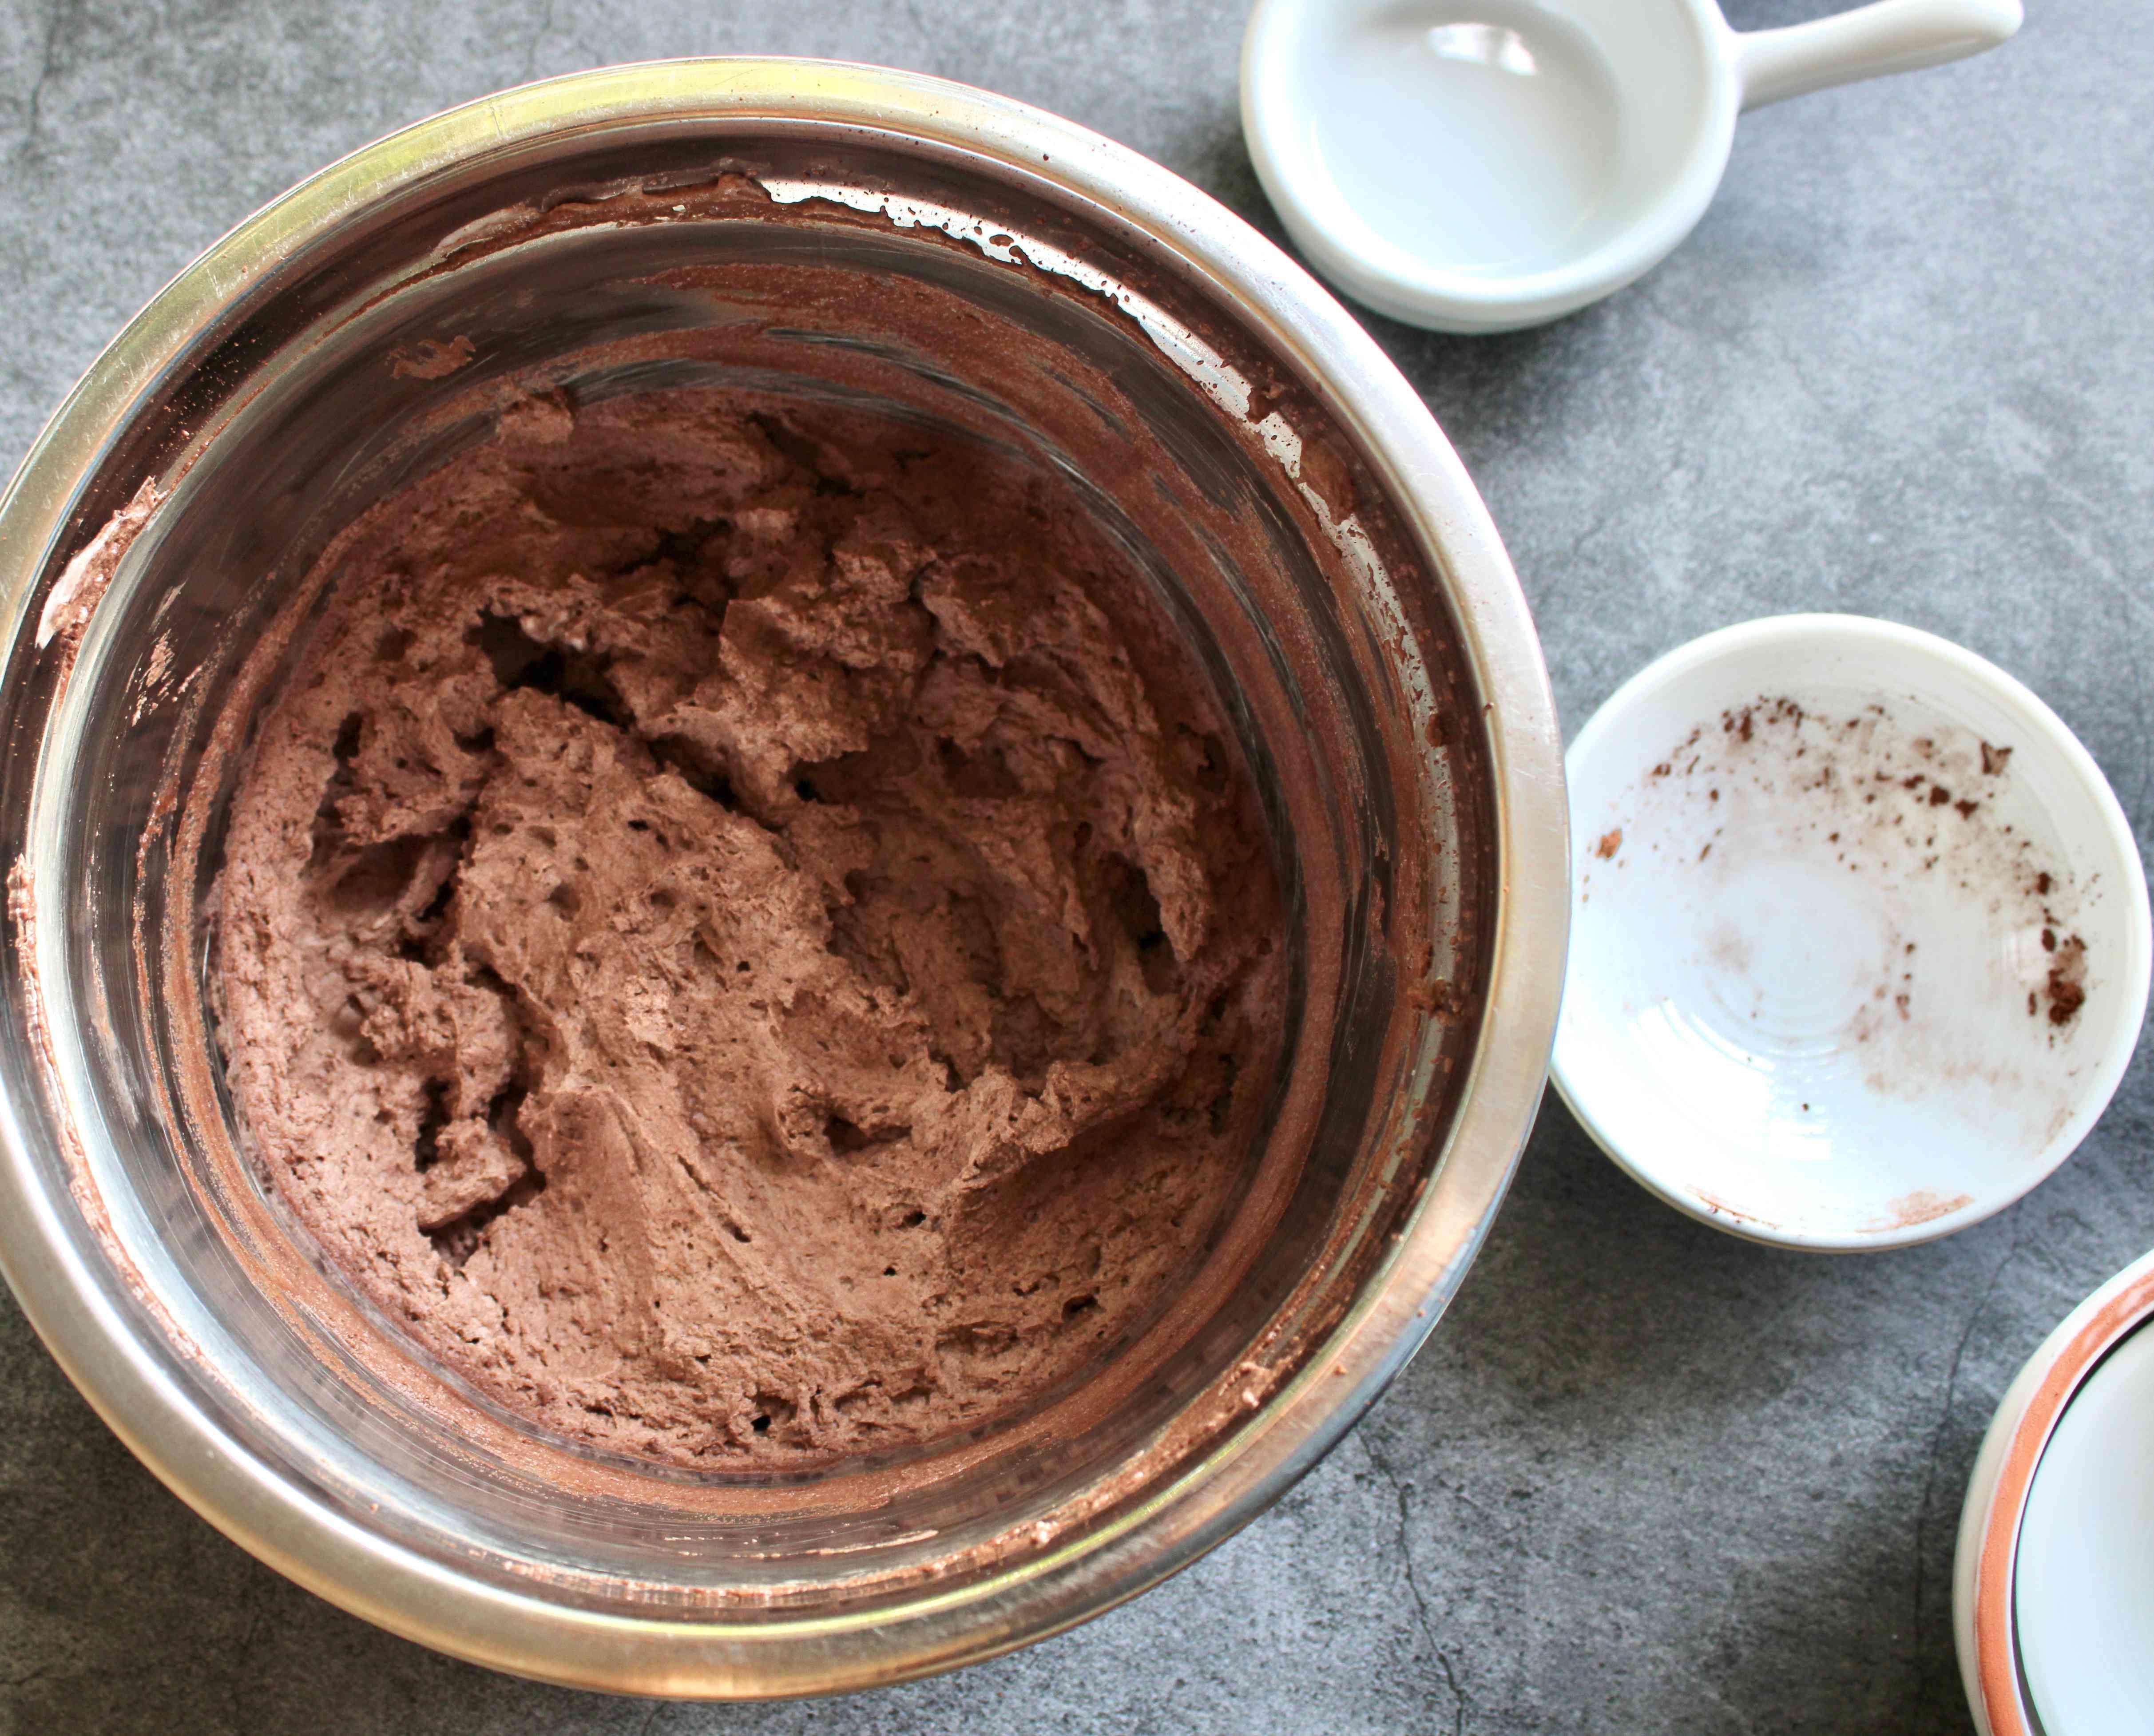 Add cocoa powder, stevia and salt